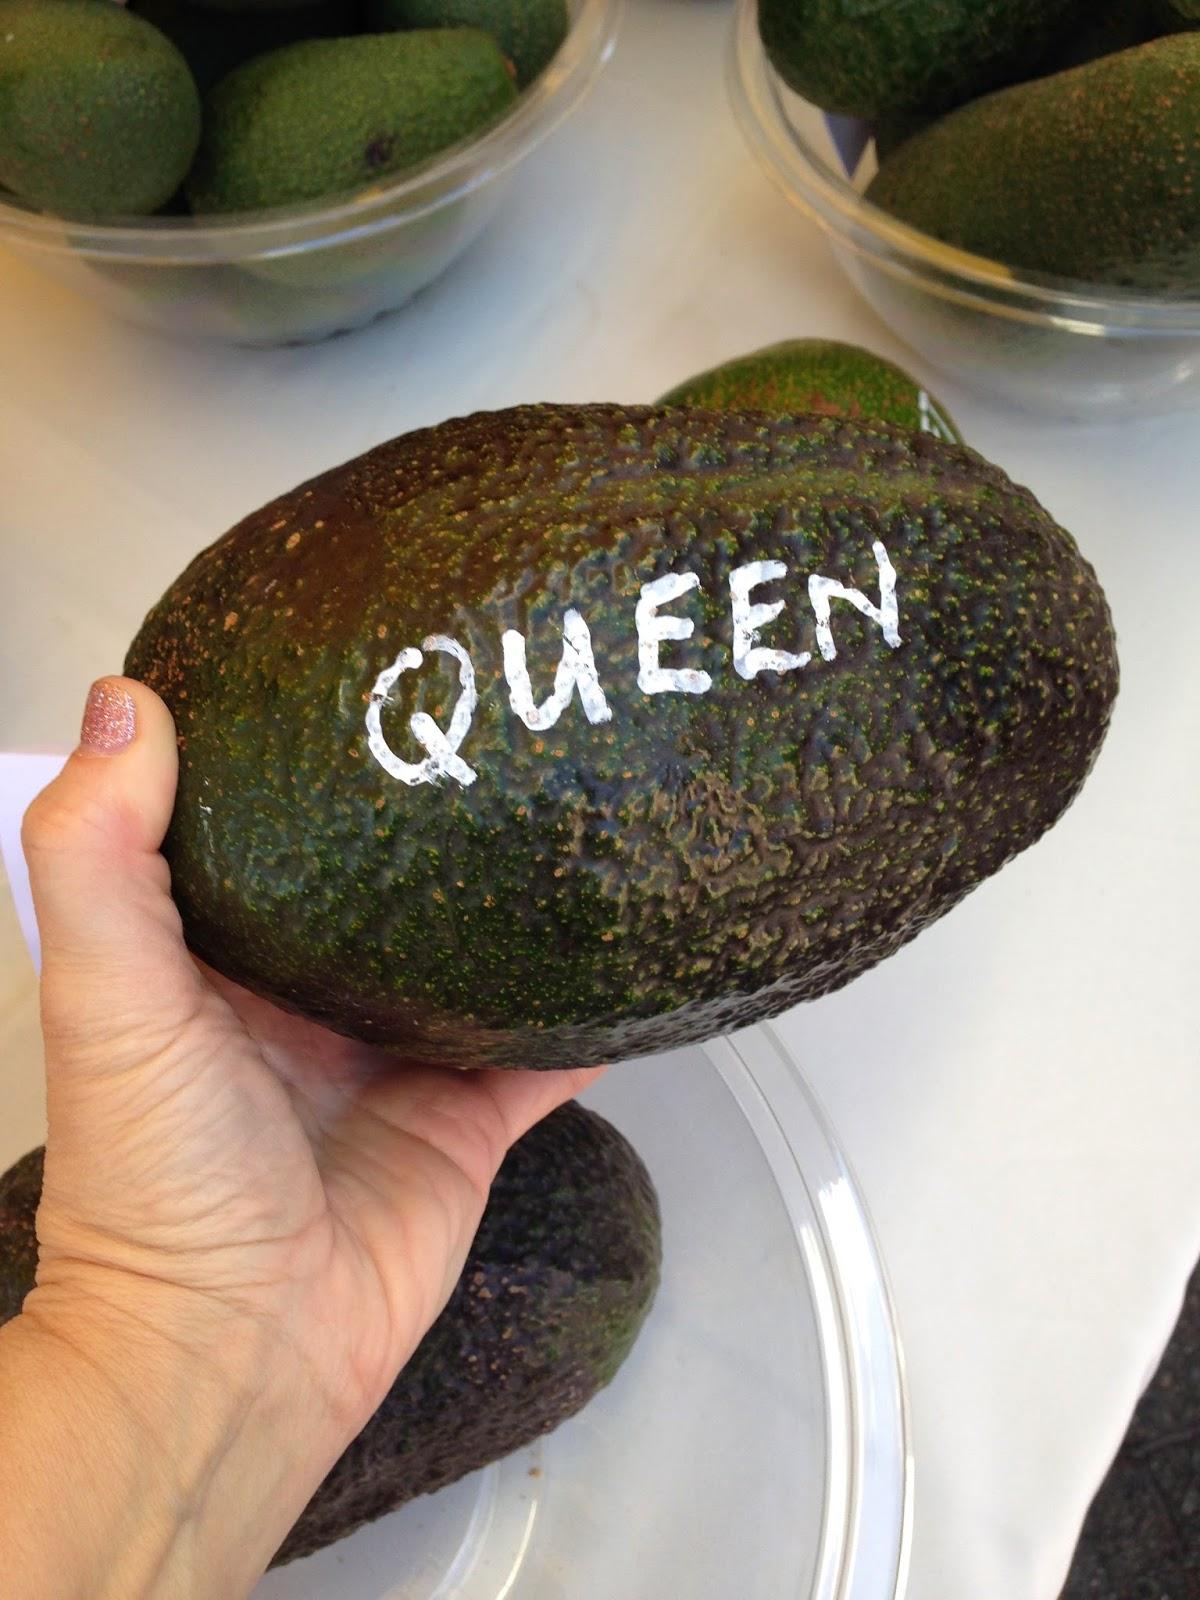 Queen%2BAvocado%2B30%2Boz Weight Loss Recipes All About the Avocado